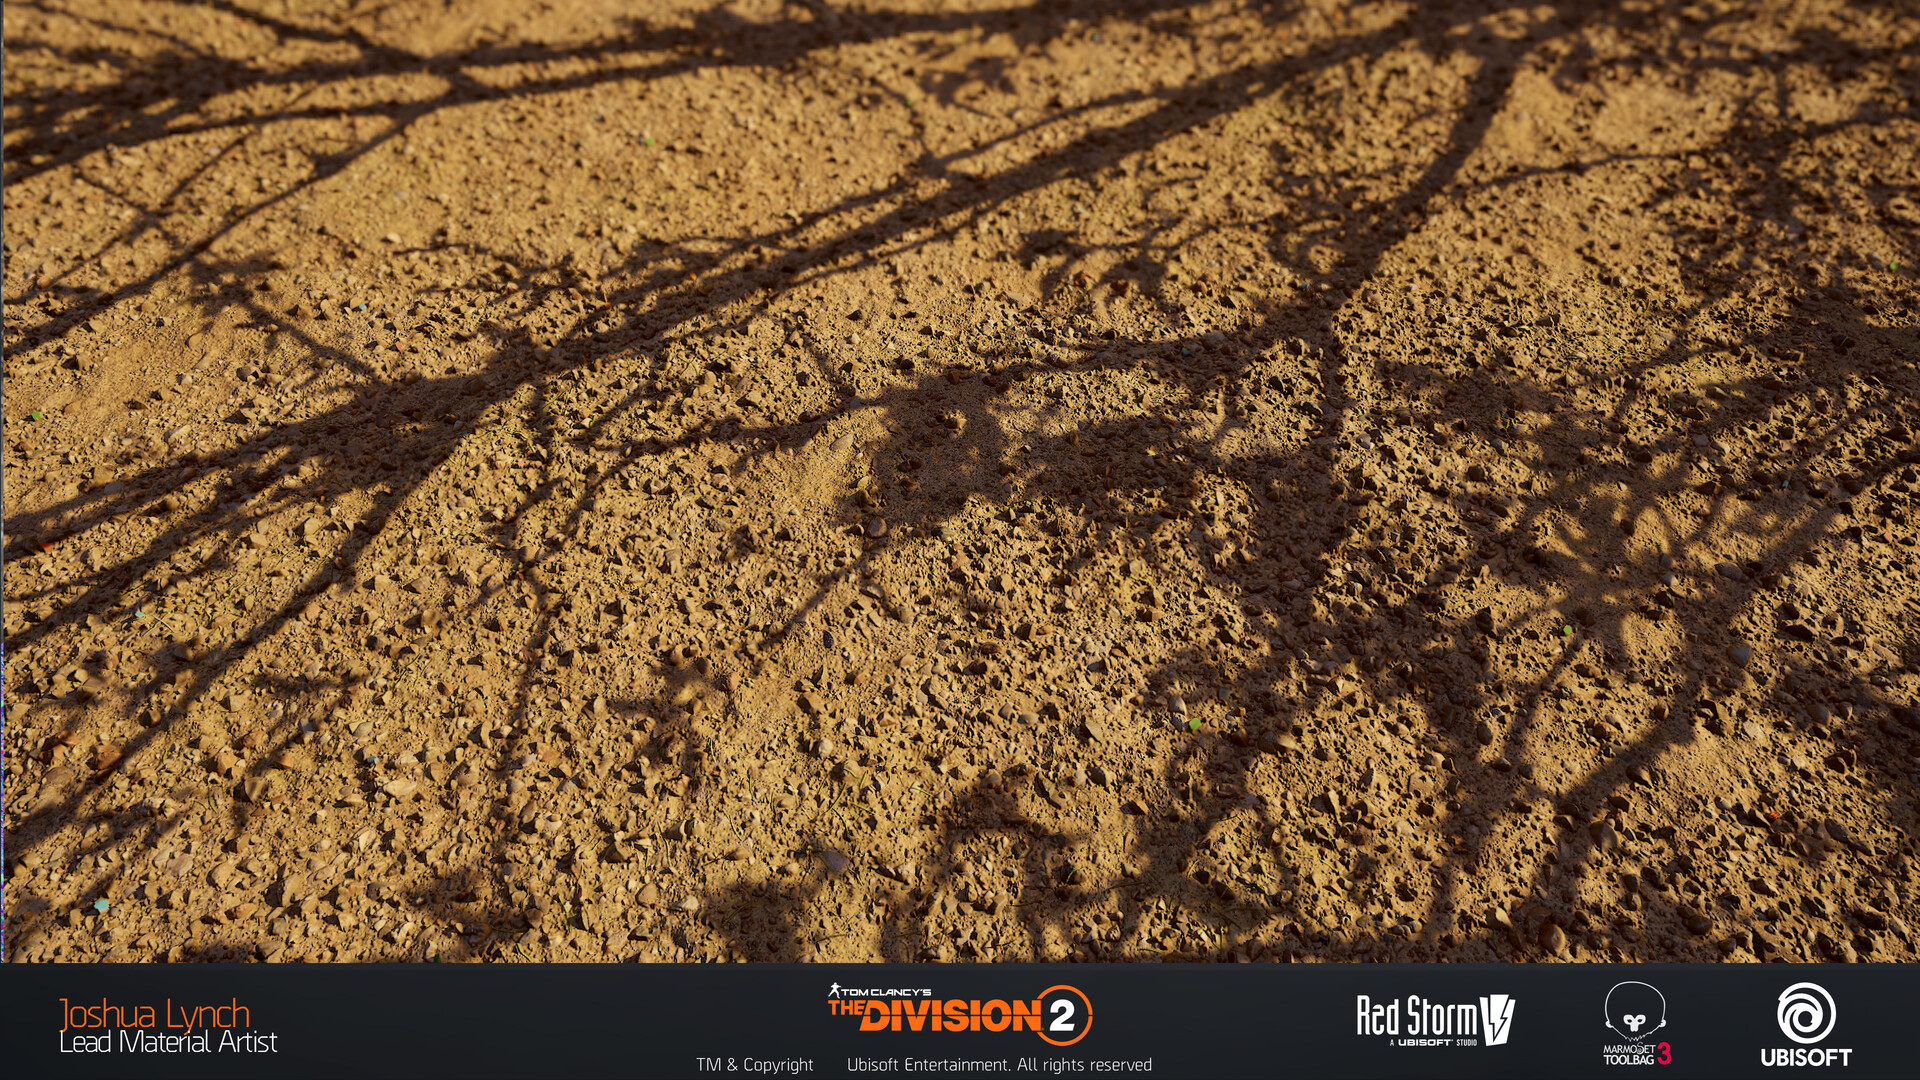 Joshua lynch division 2 josh lynch soil gravel 01 ground